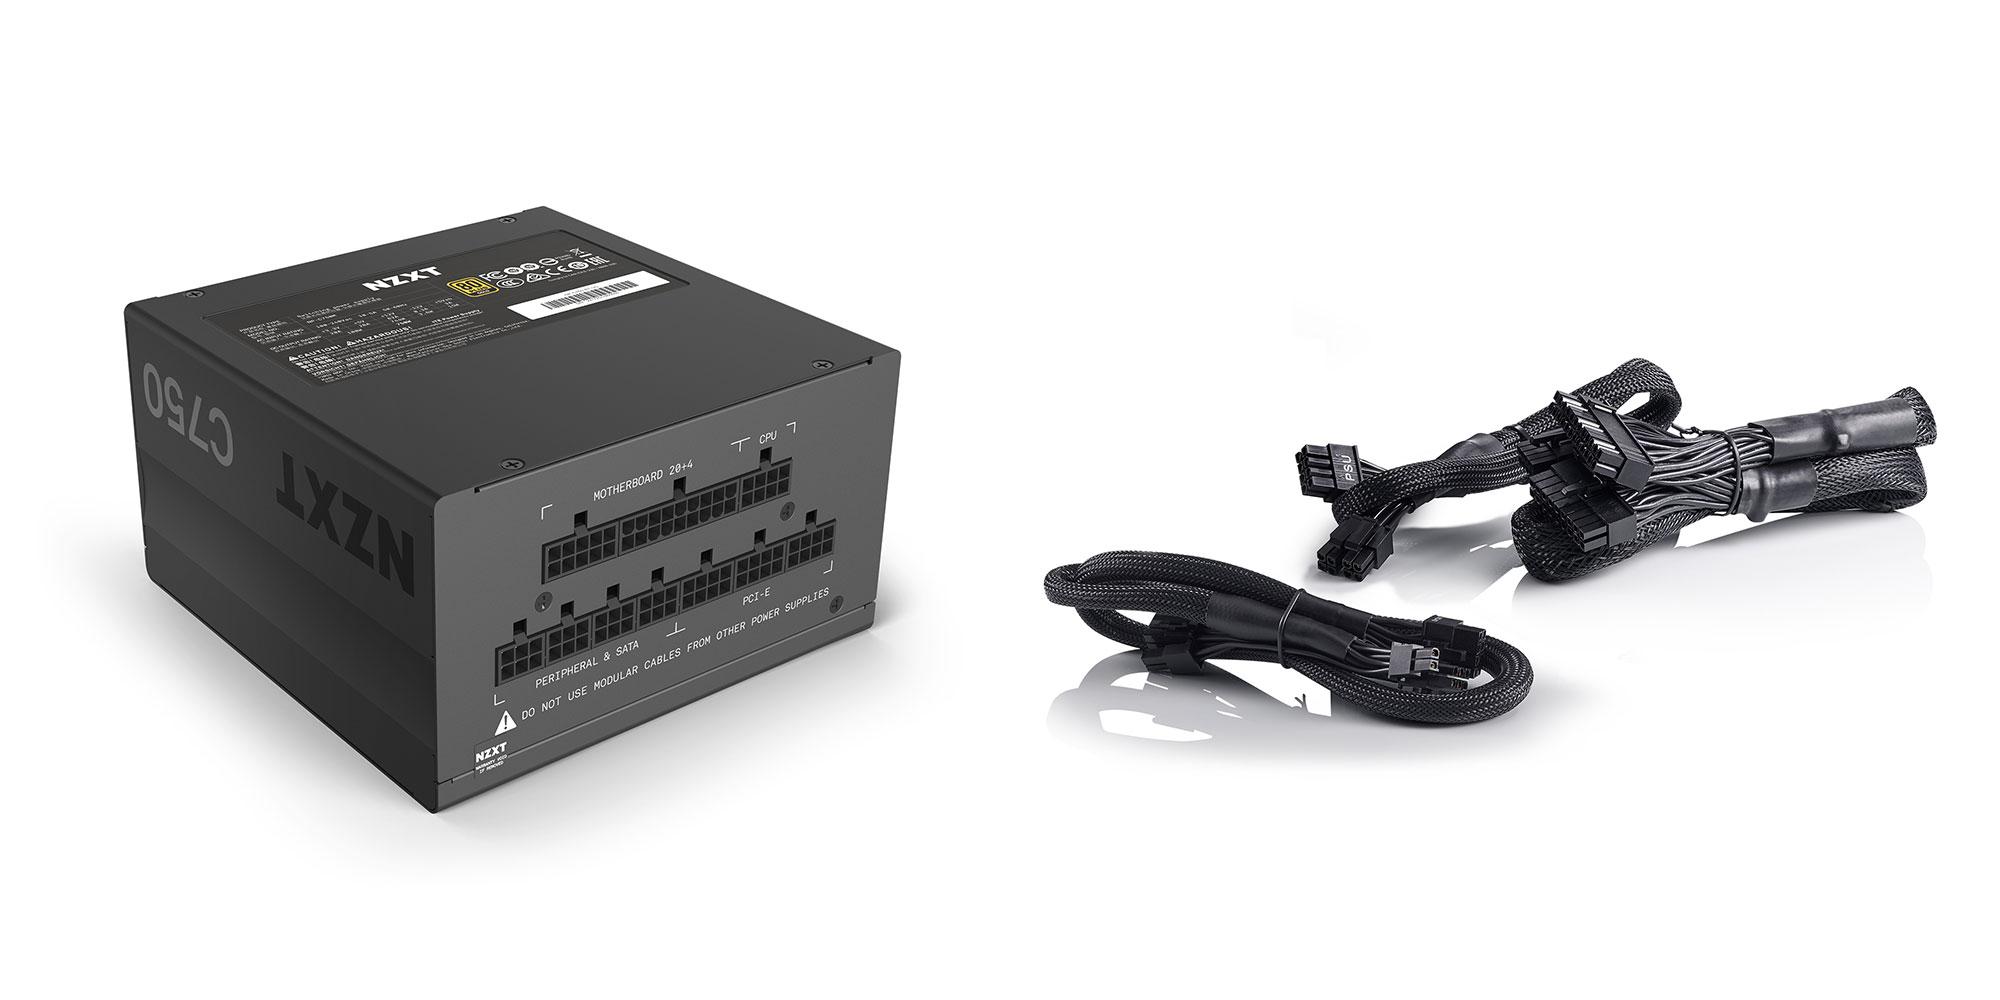 nzxt c750 power supply